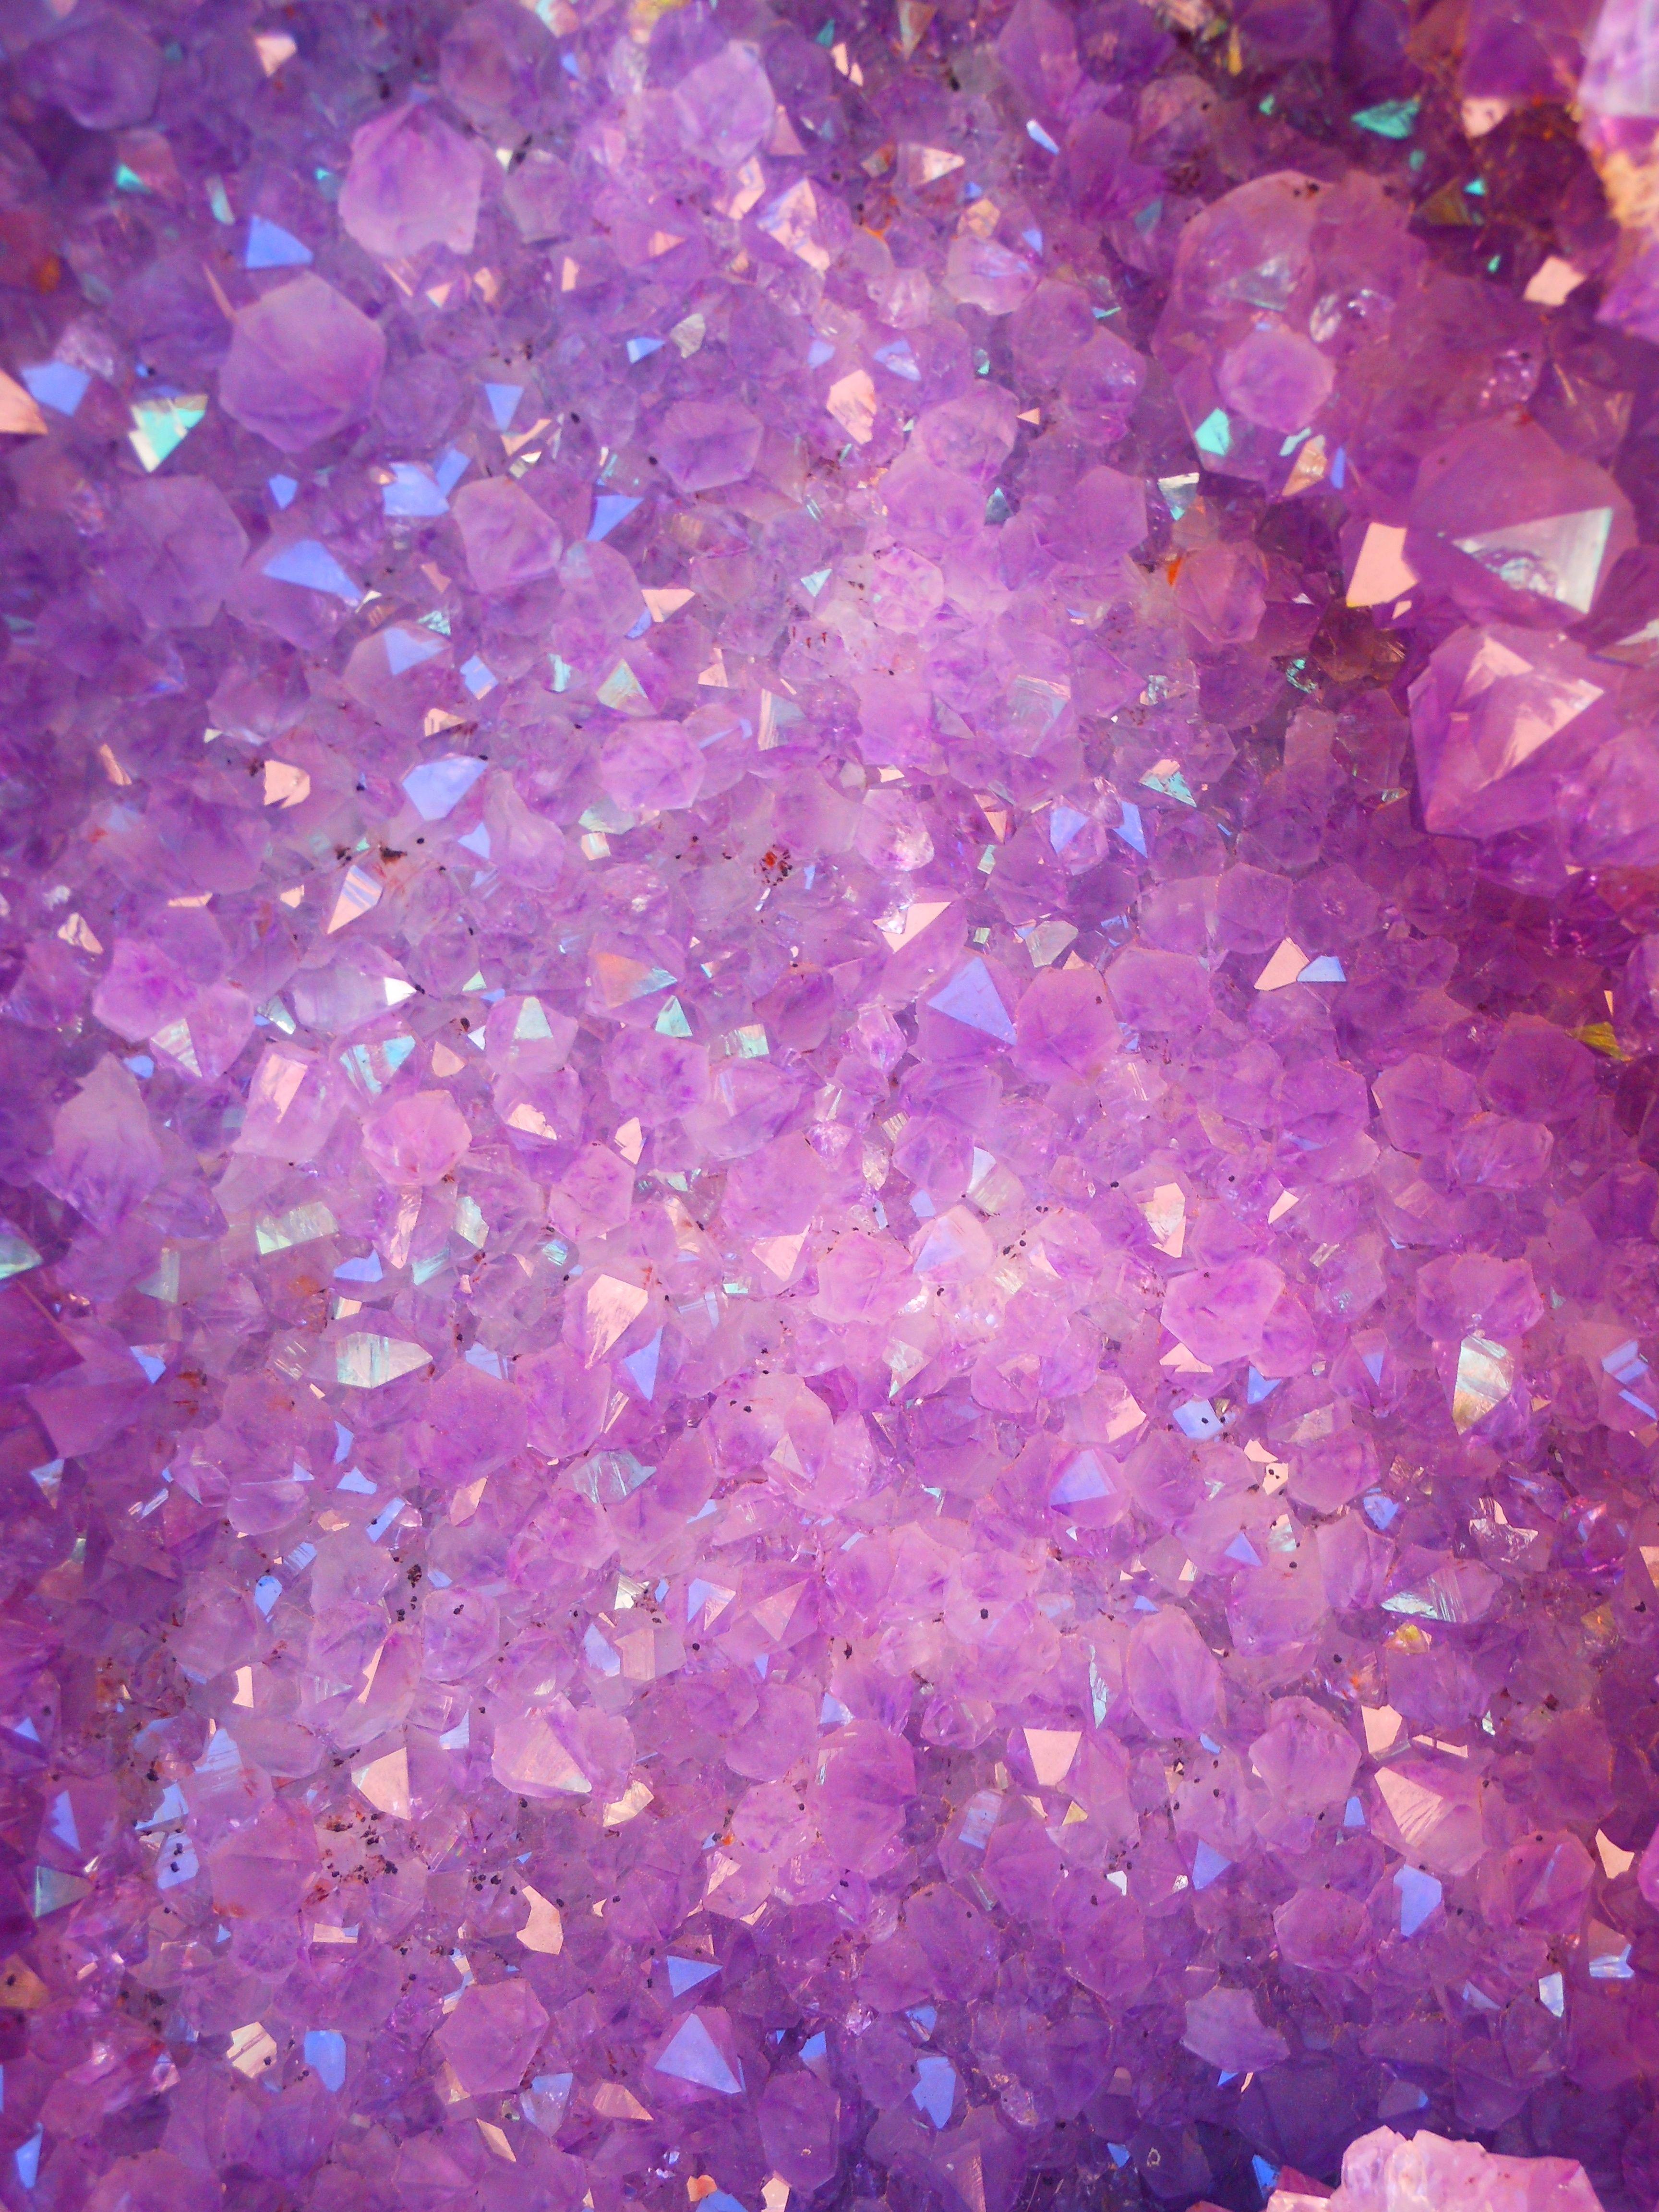 gallery for amethyst crystal wallpaper